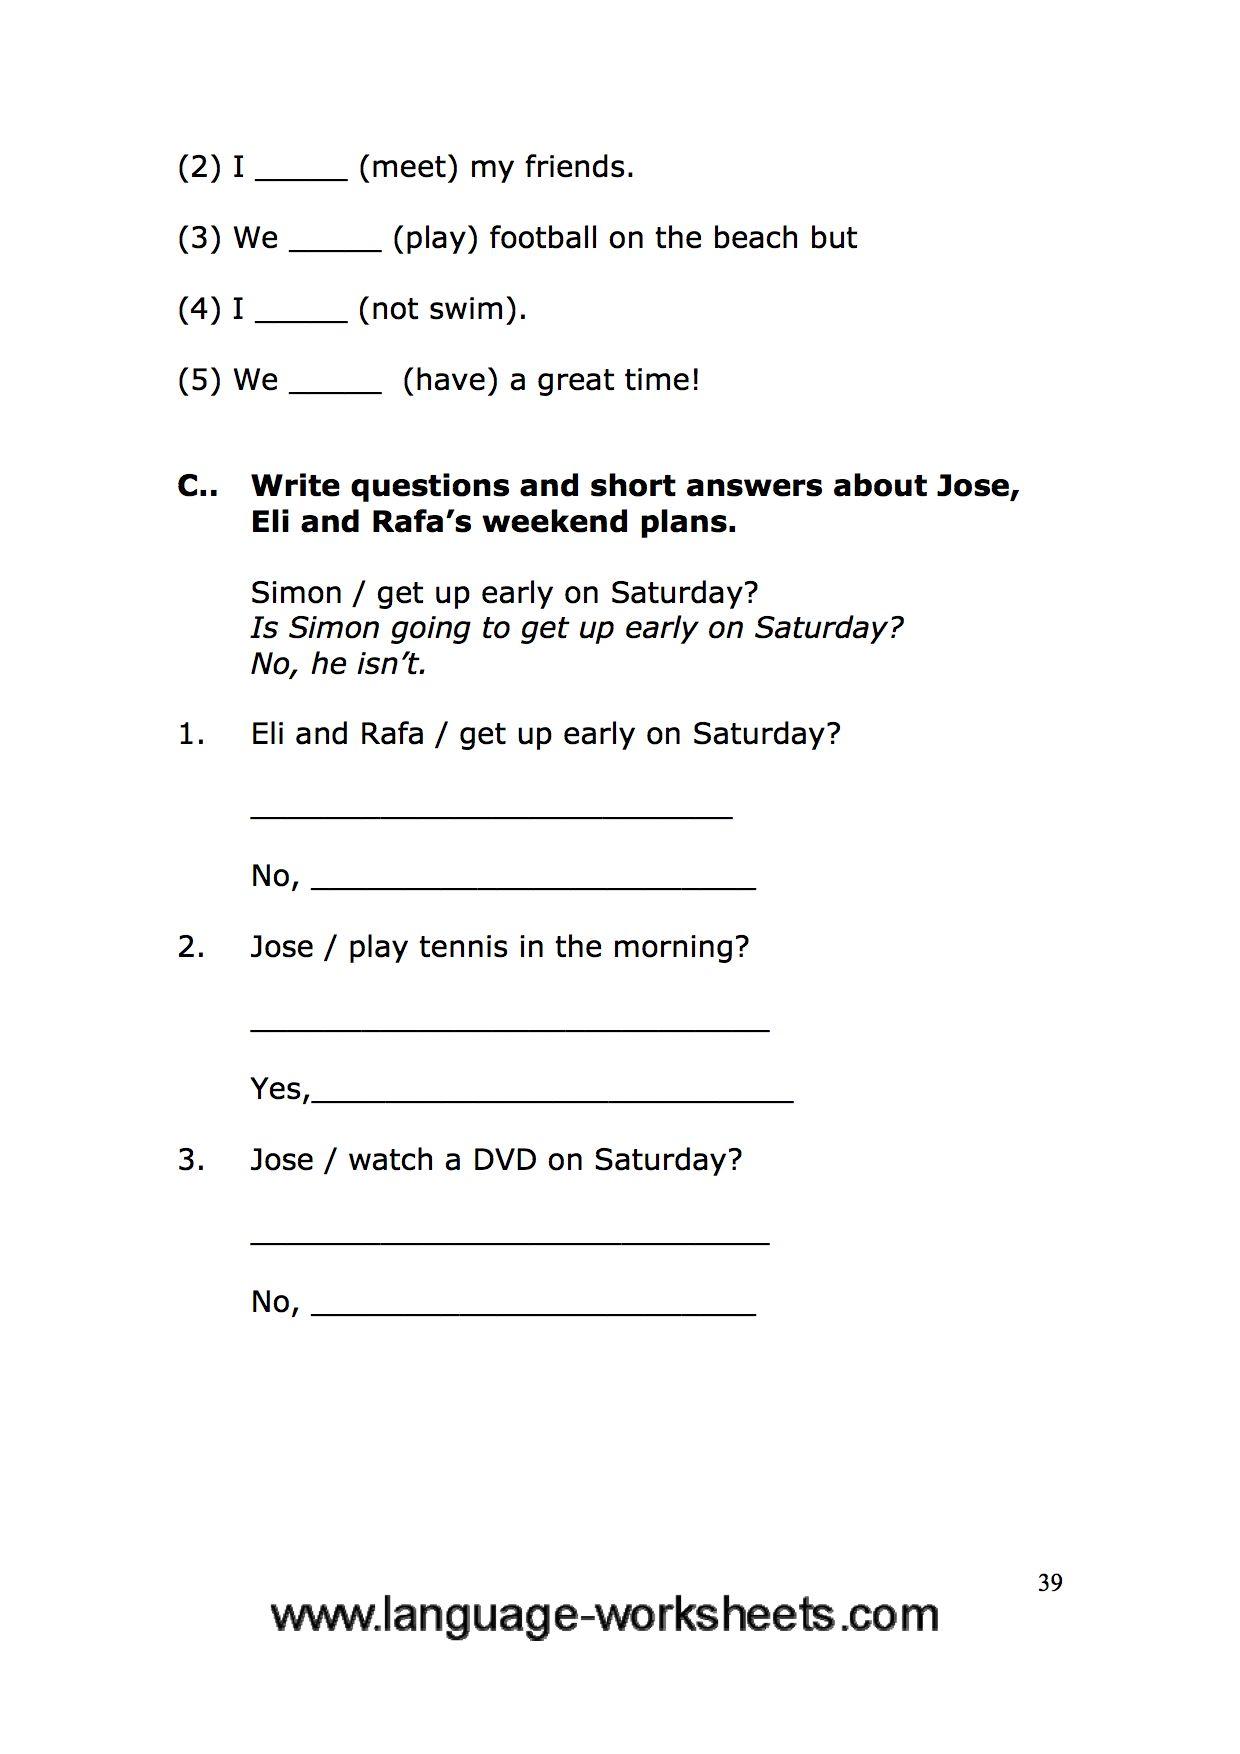 Grammar Worksheets 39